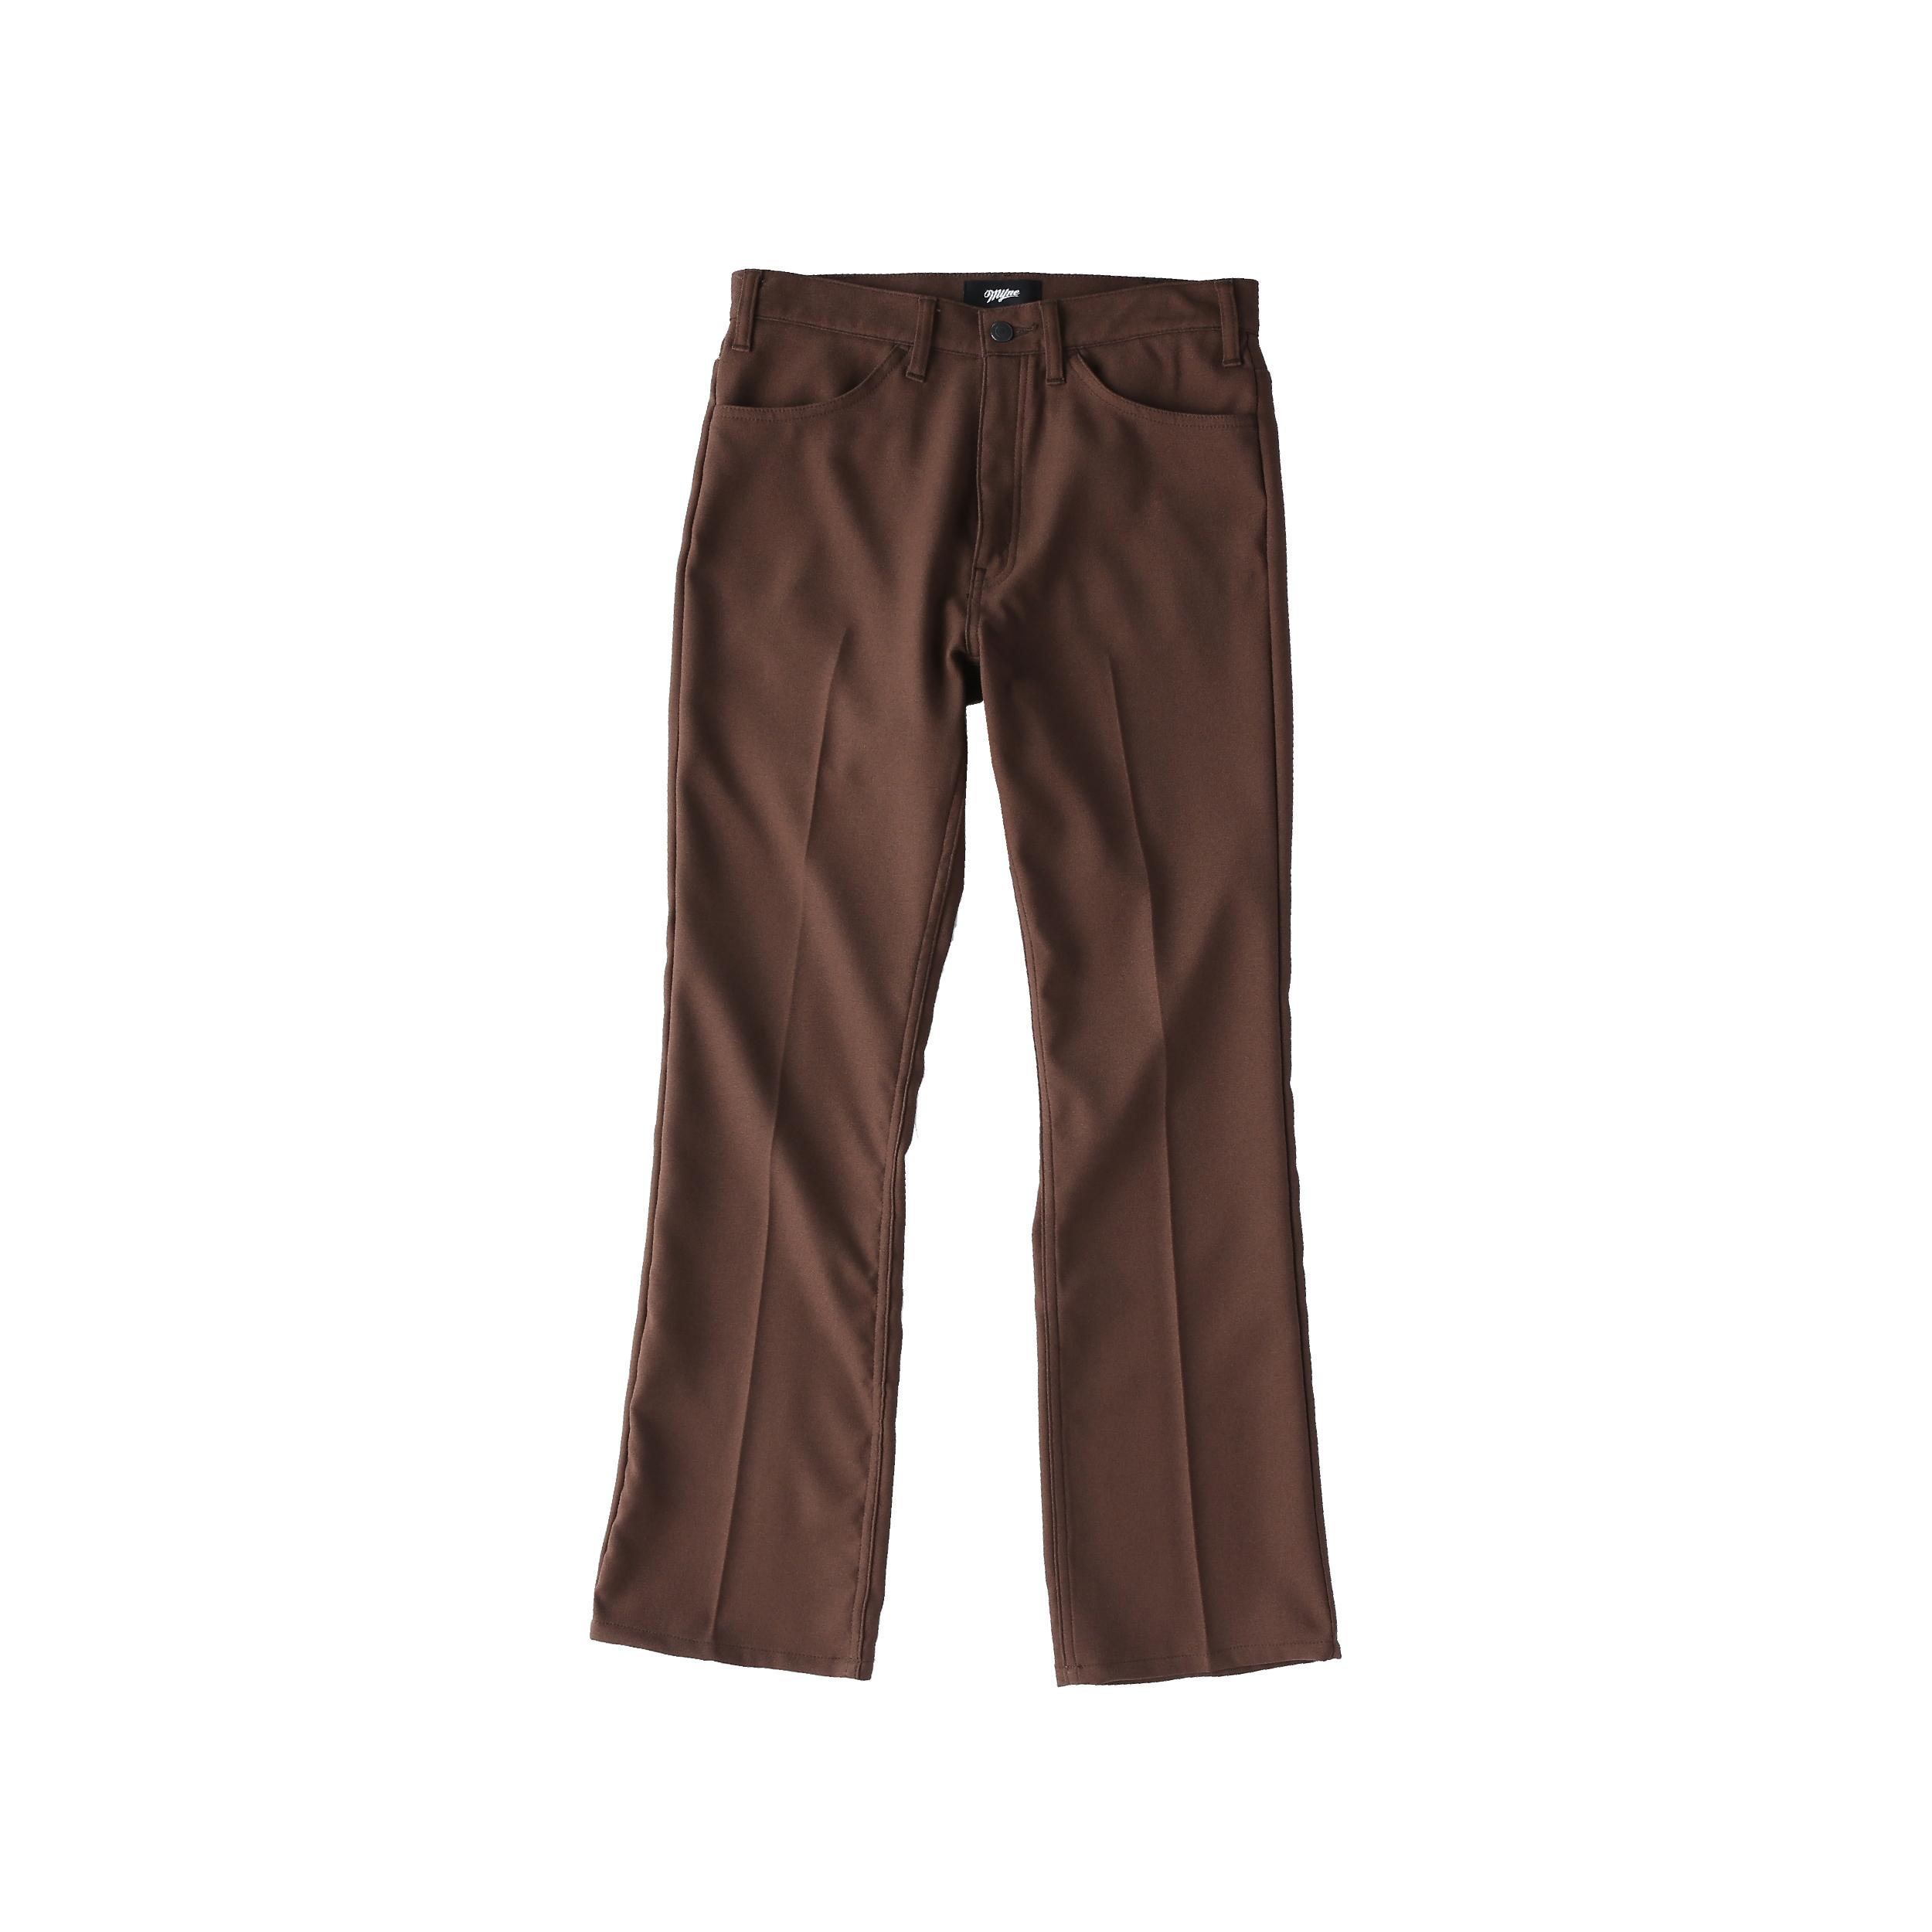 Wappen boot-cut pants / BROWN - 画像1